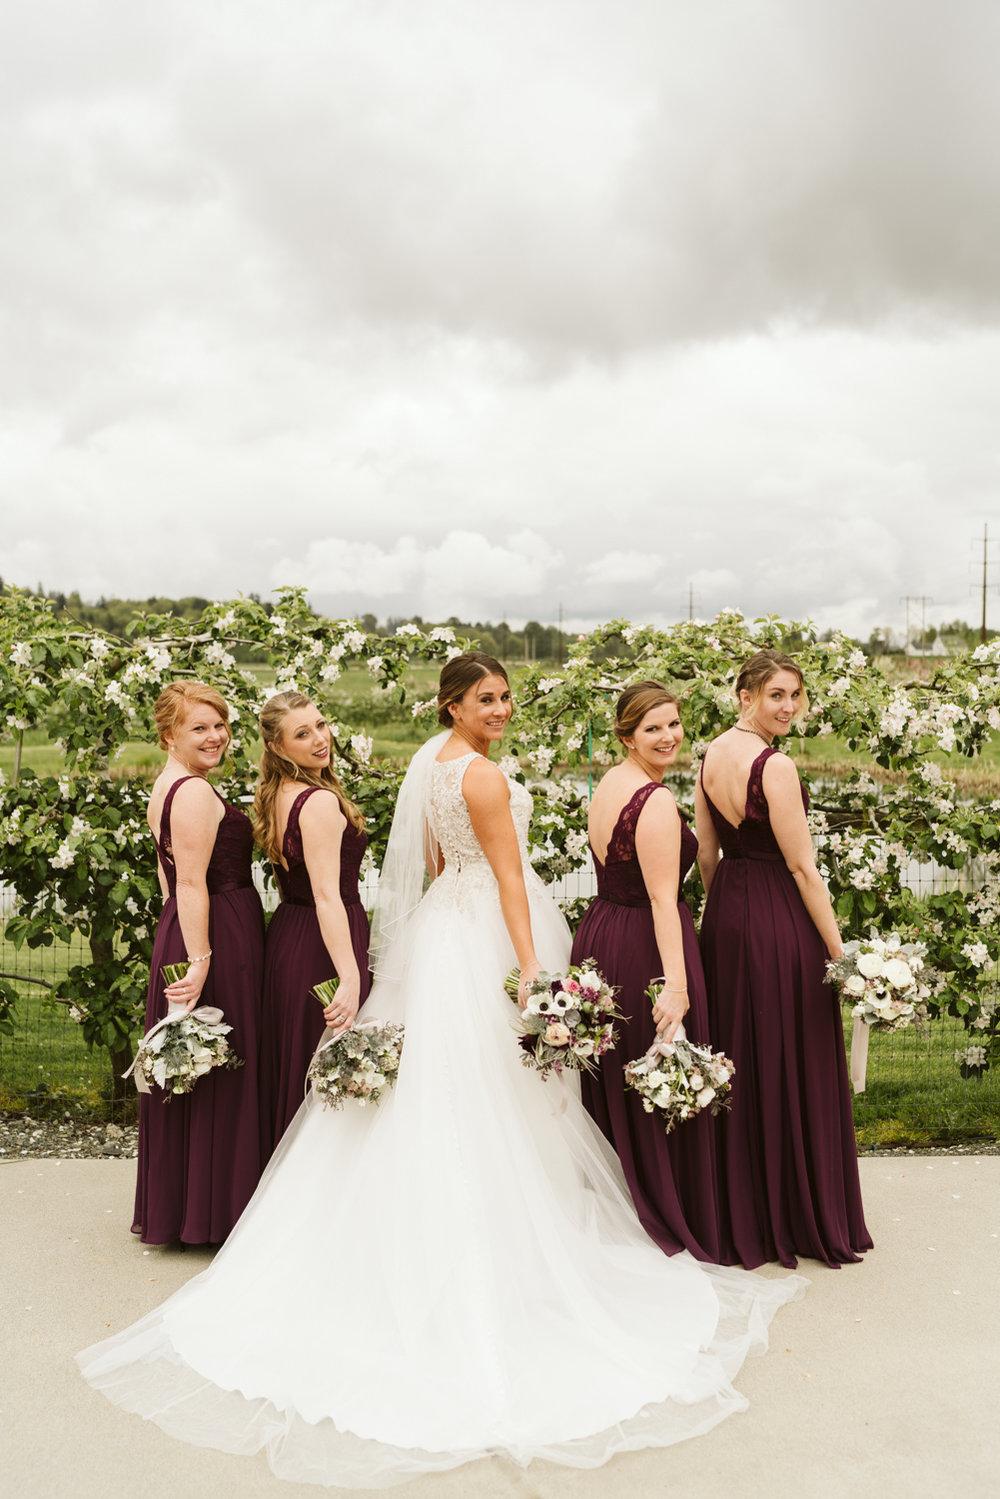 April Yentas Photography - jen and anthony wedding-29.jpg